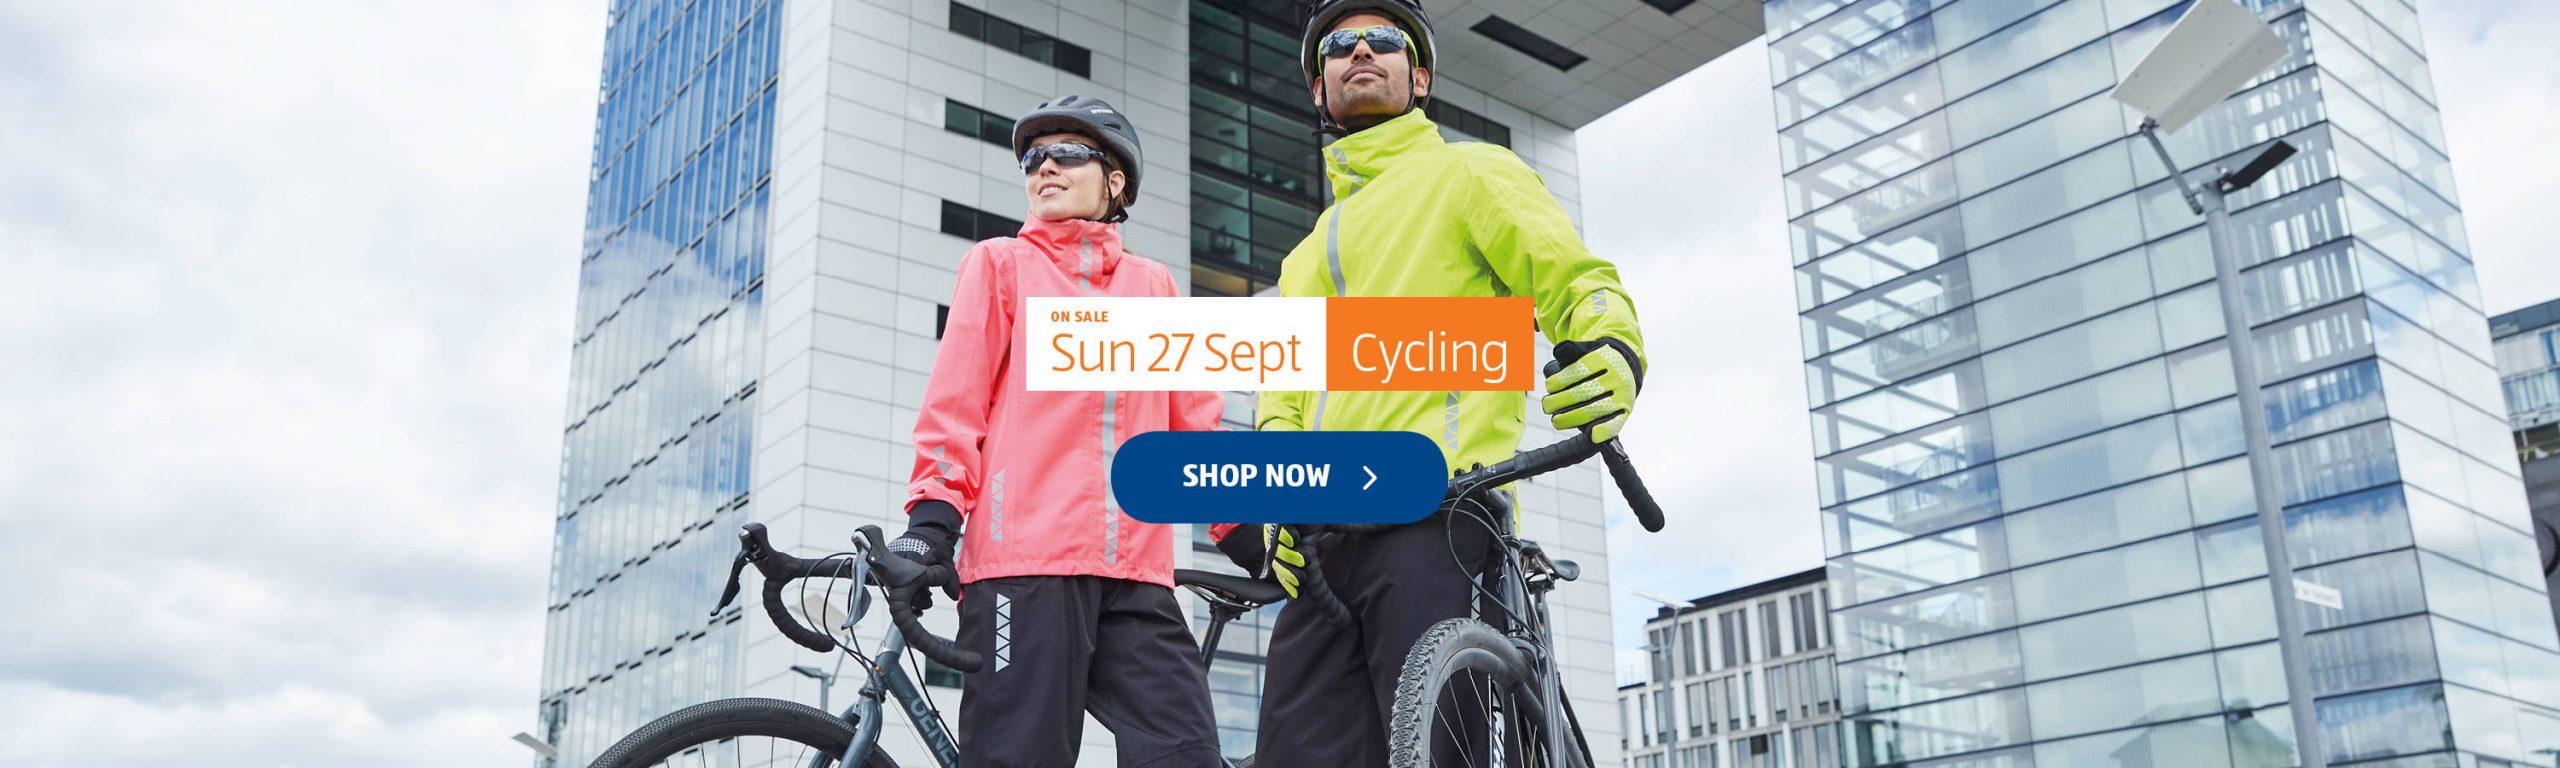 ALDI Sunday Offers 27th September 2020 ALDI Cycling